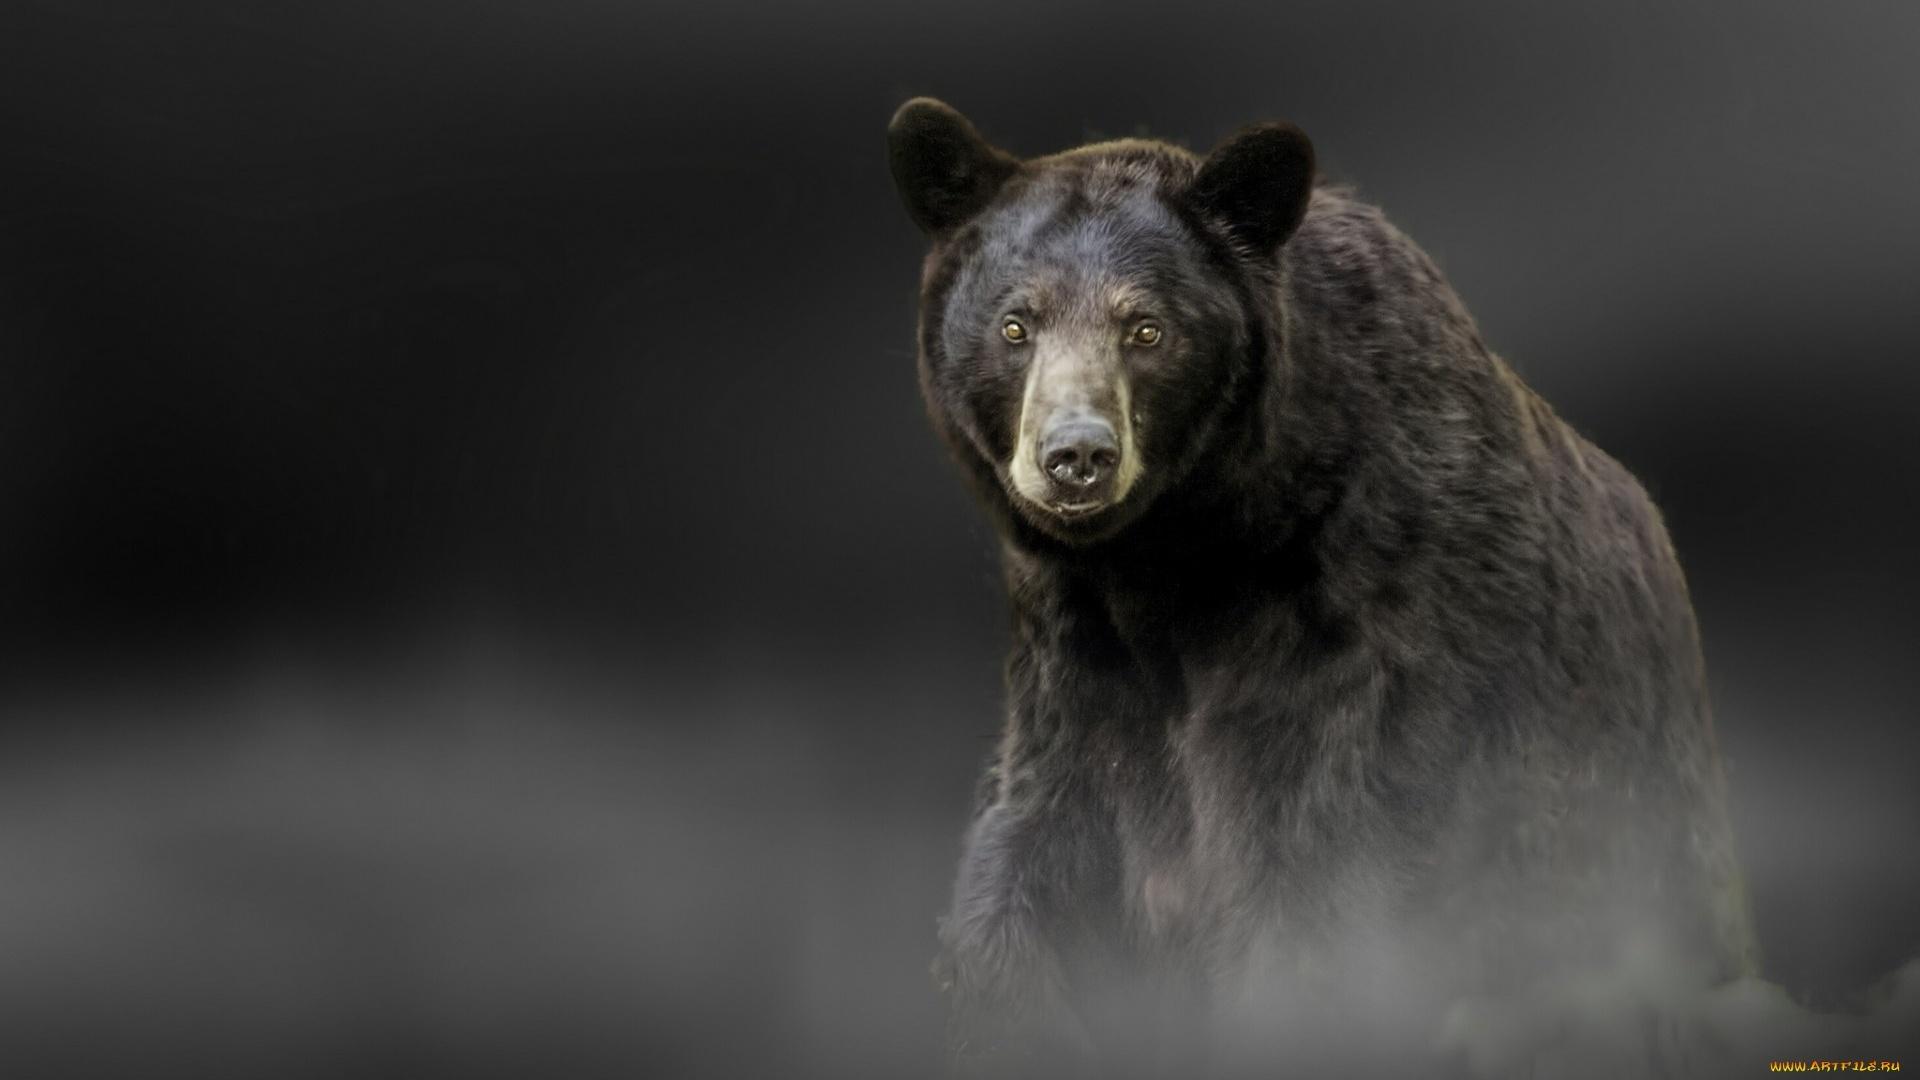 Black Bear Desktop Wallpaper